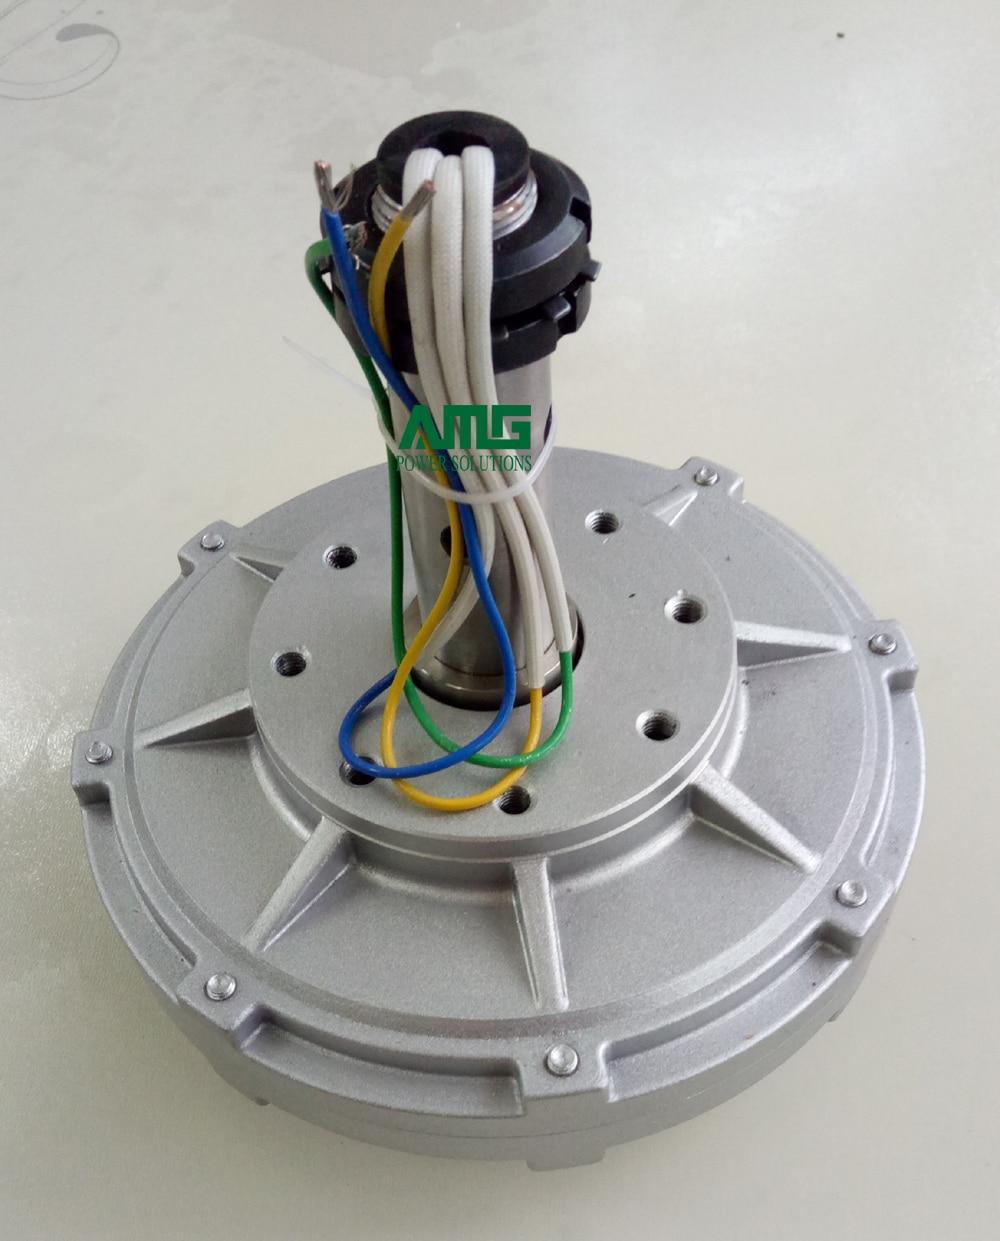 100W 130 200 300 500RPM 12 24 48VDC Low RPM Low Start Torque Vertical Alternator inner